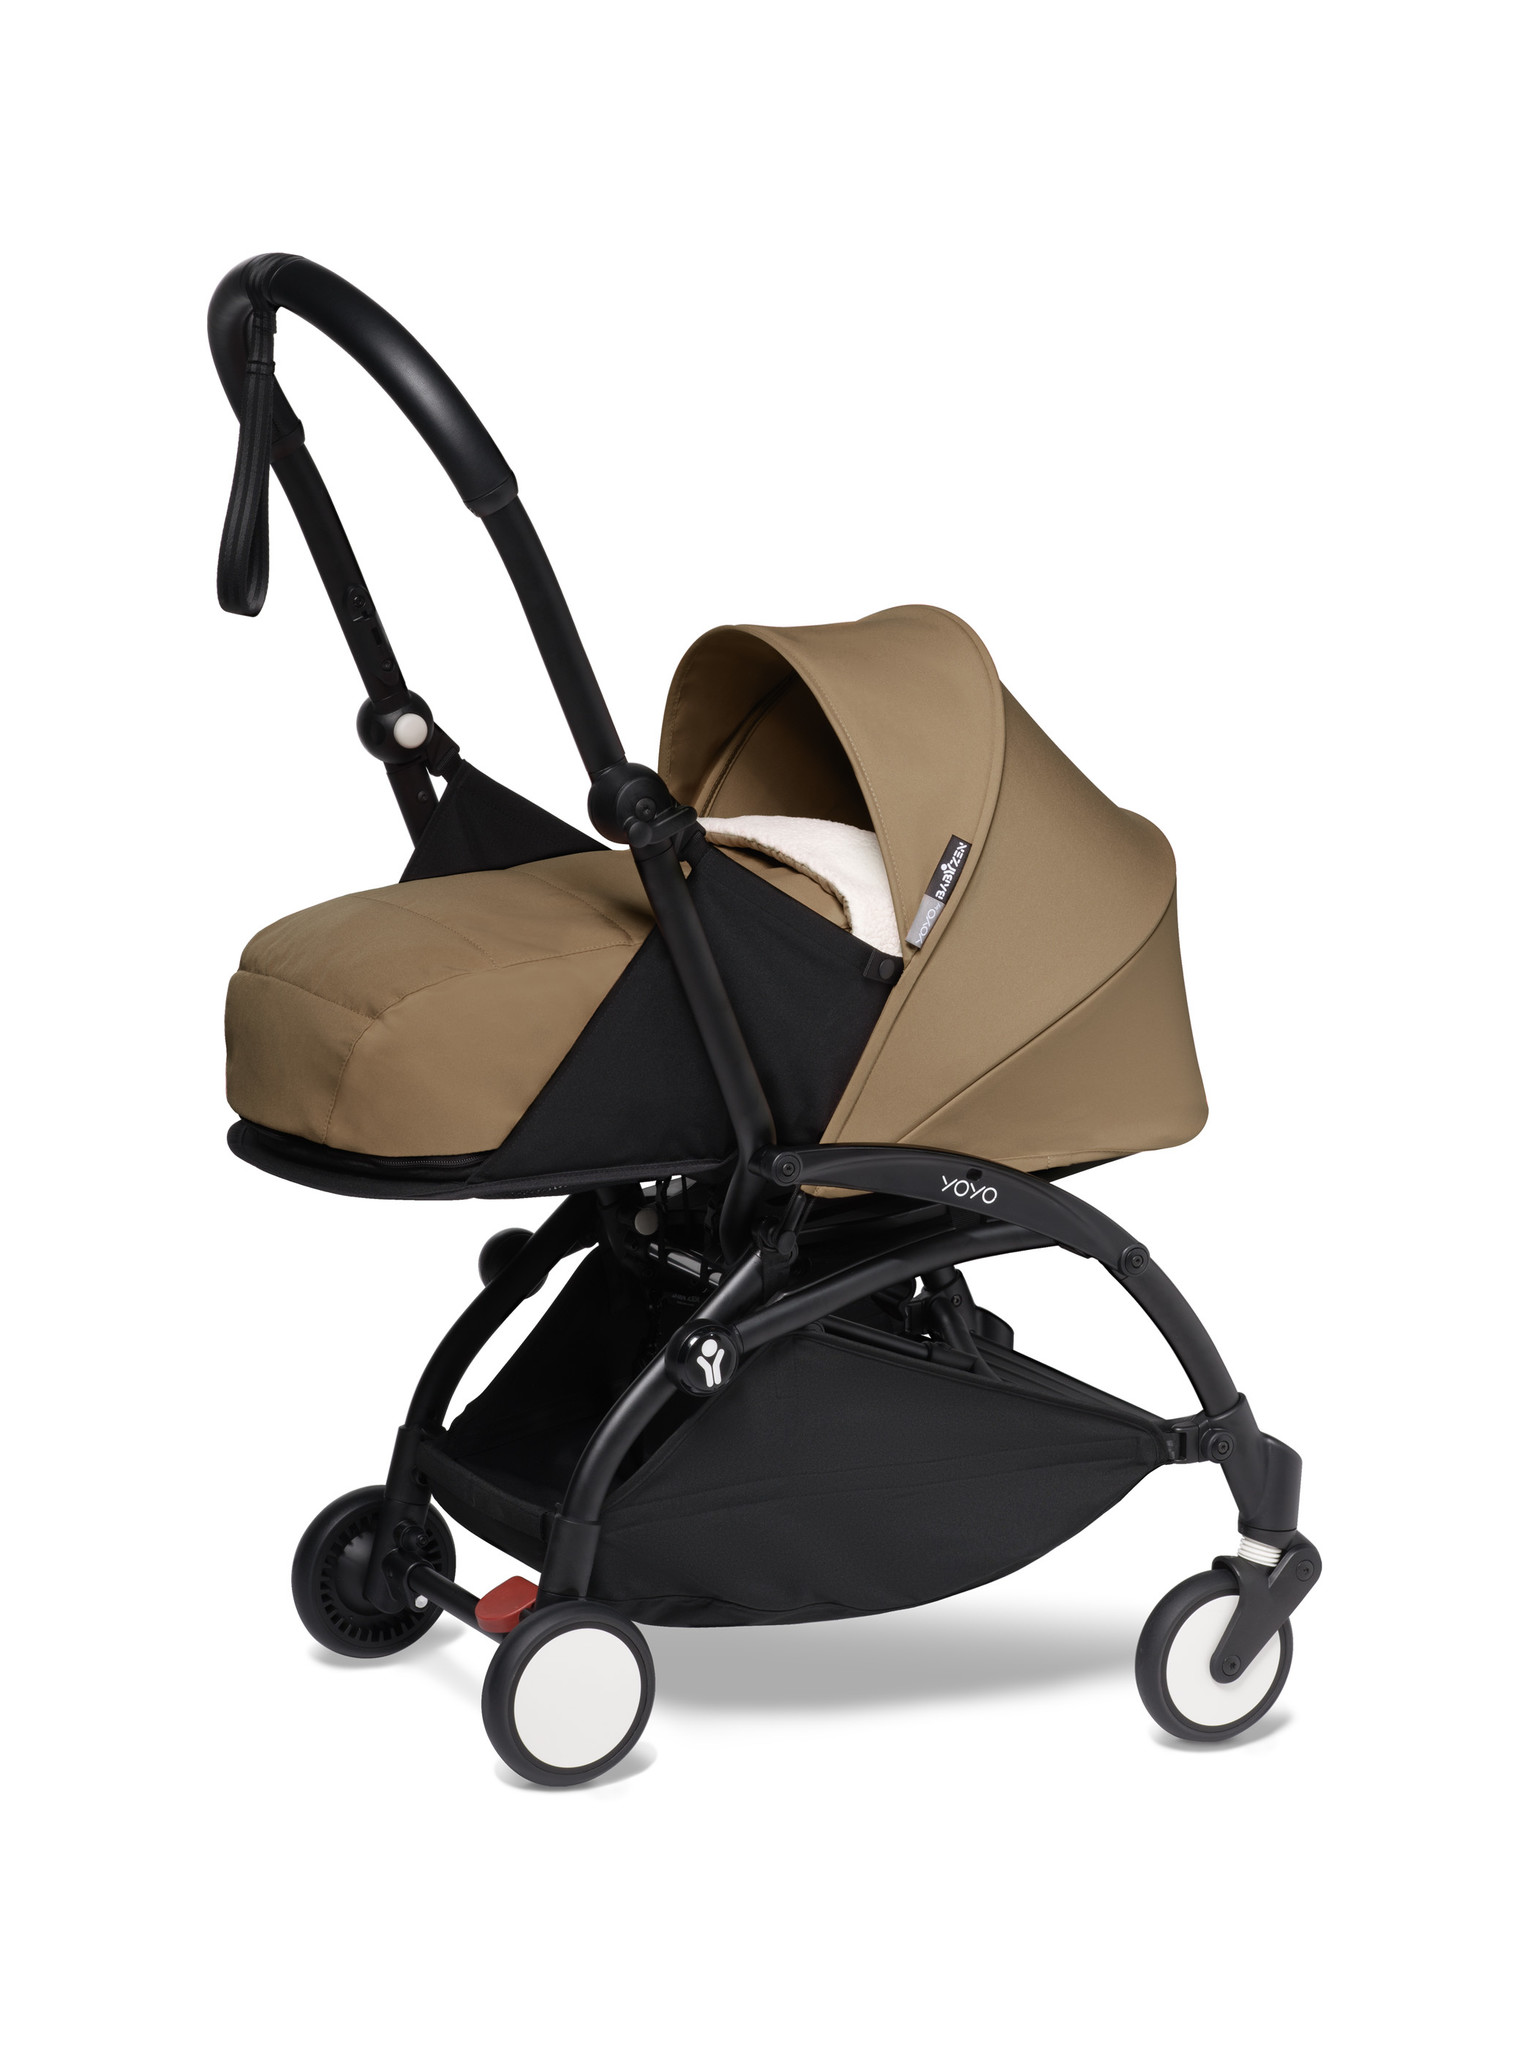 Babyzen Babyzen YOYO² Buggy KOMPLETT / VOLL SET 0+ und 6+ Toffee Rahmen schwarz inkl. YOYO² BeSafe Autositz schwarz